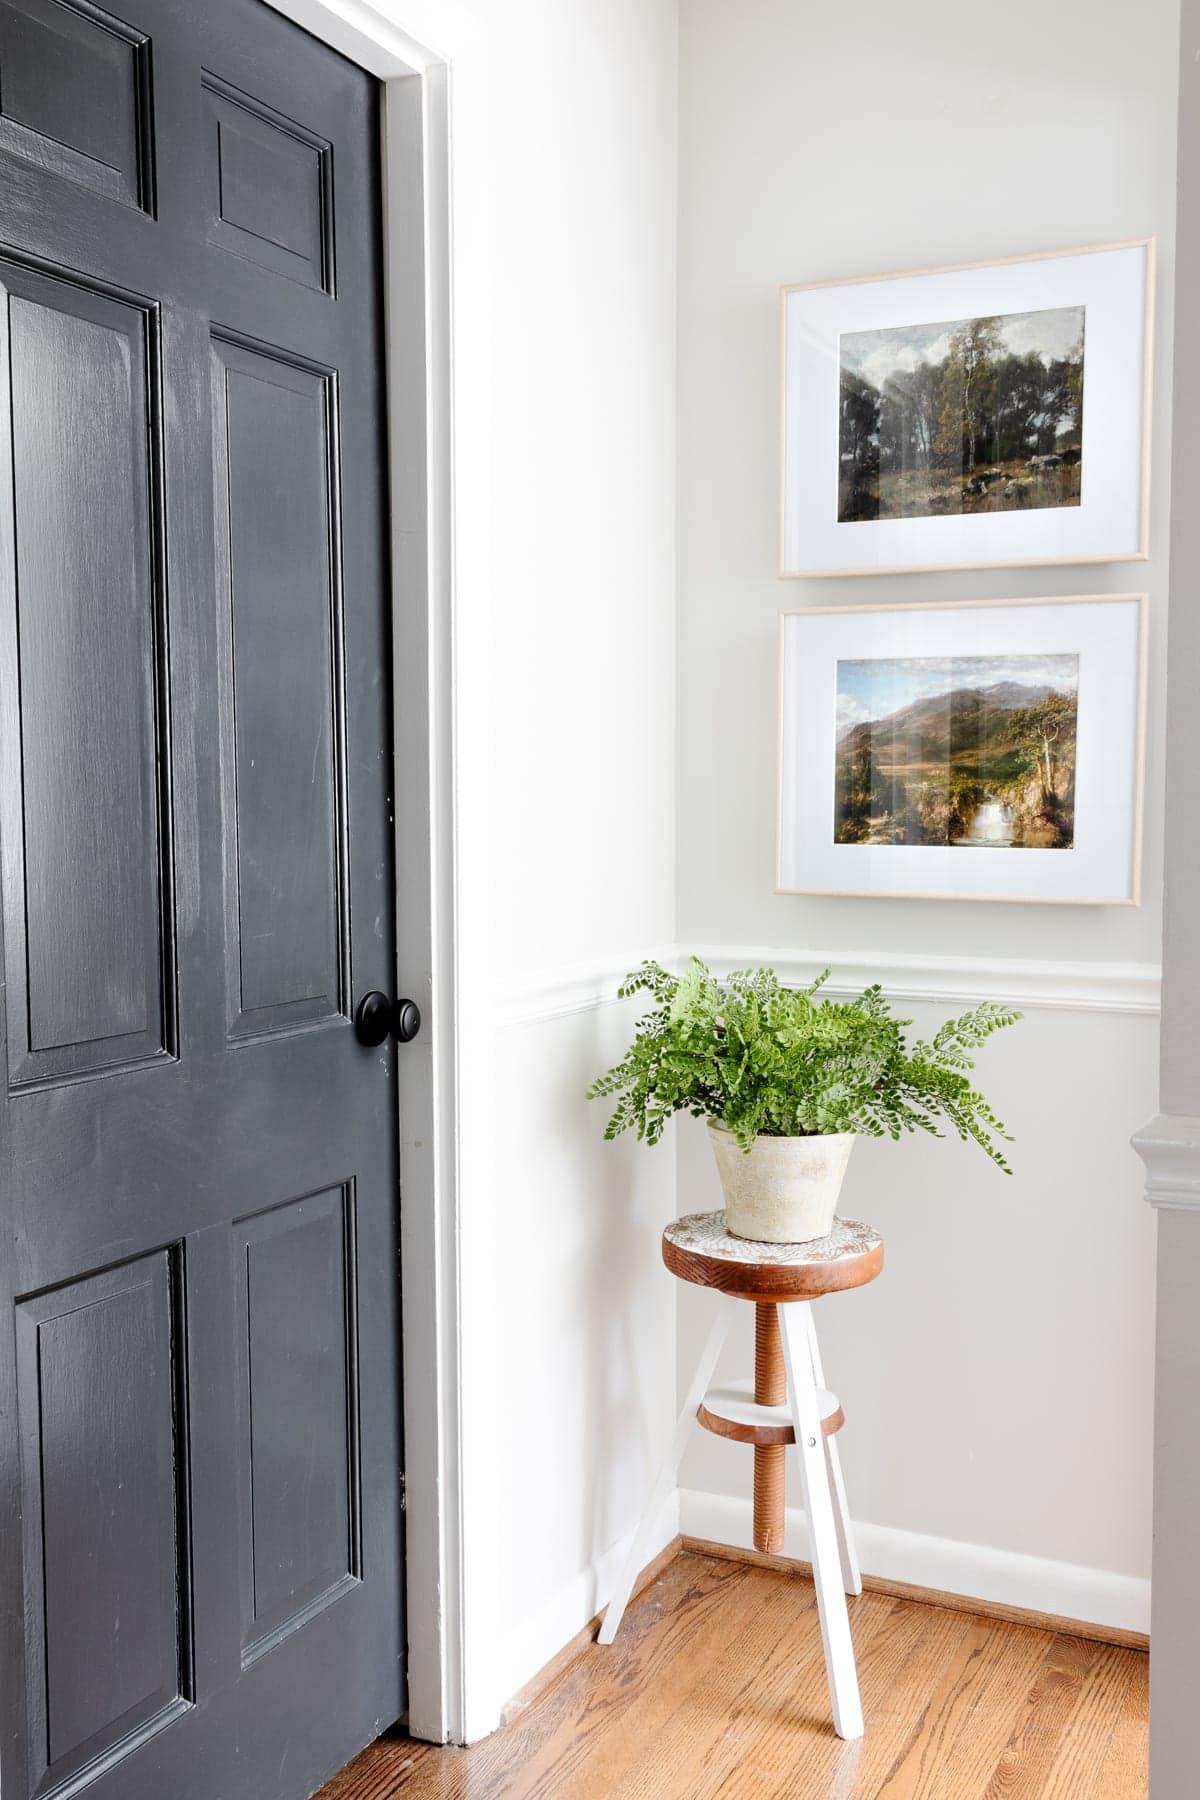 Antique Landscape Oil Paintings Free Printable Art and Hallway Decor